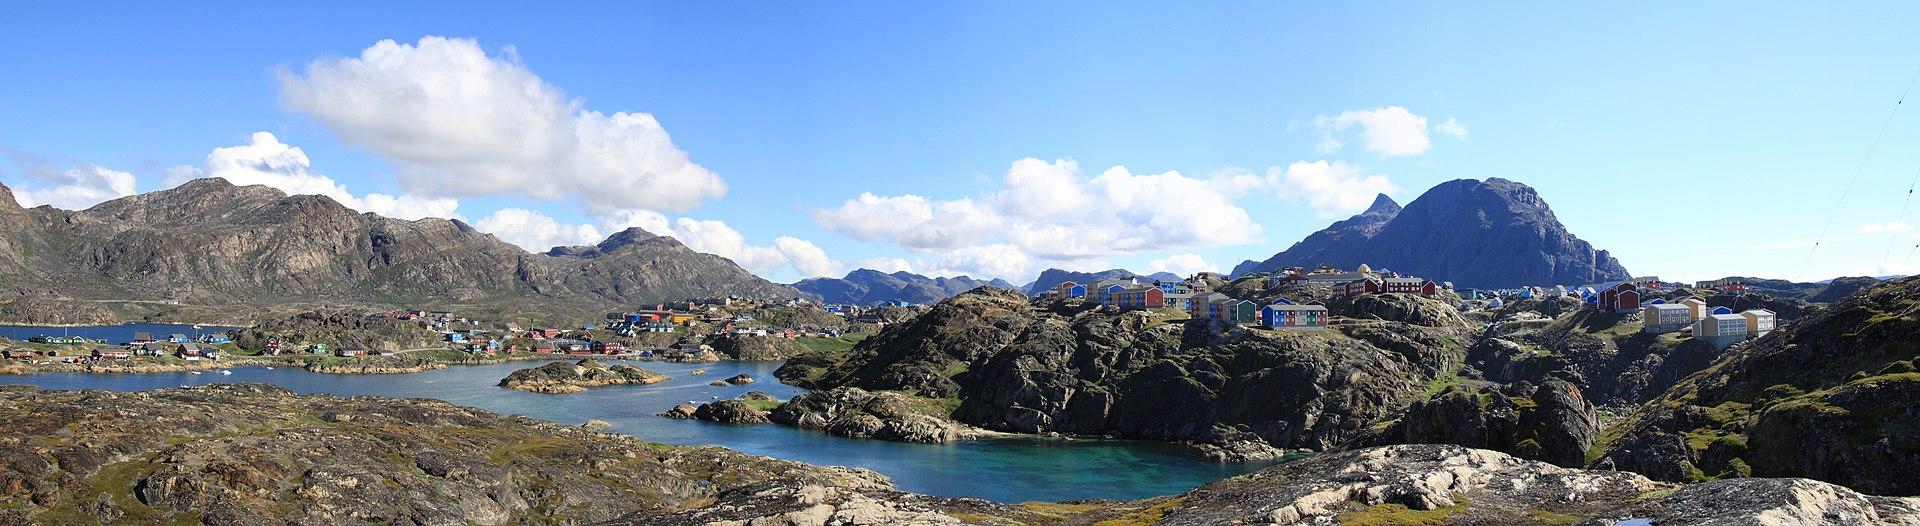 Sisimiut panorama in summer 2010 (1).jpg